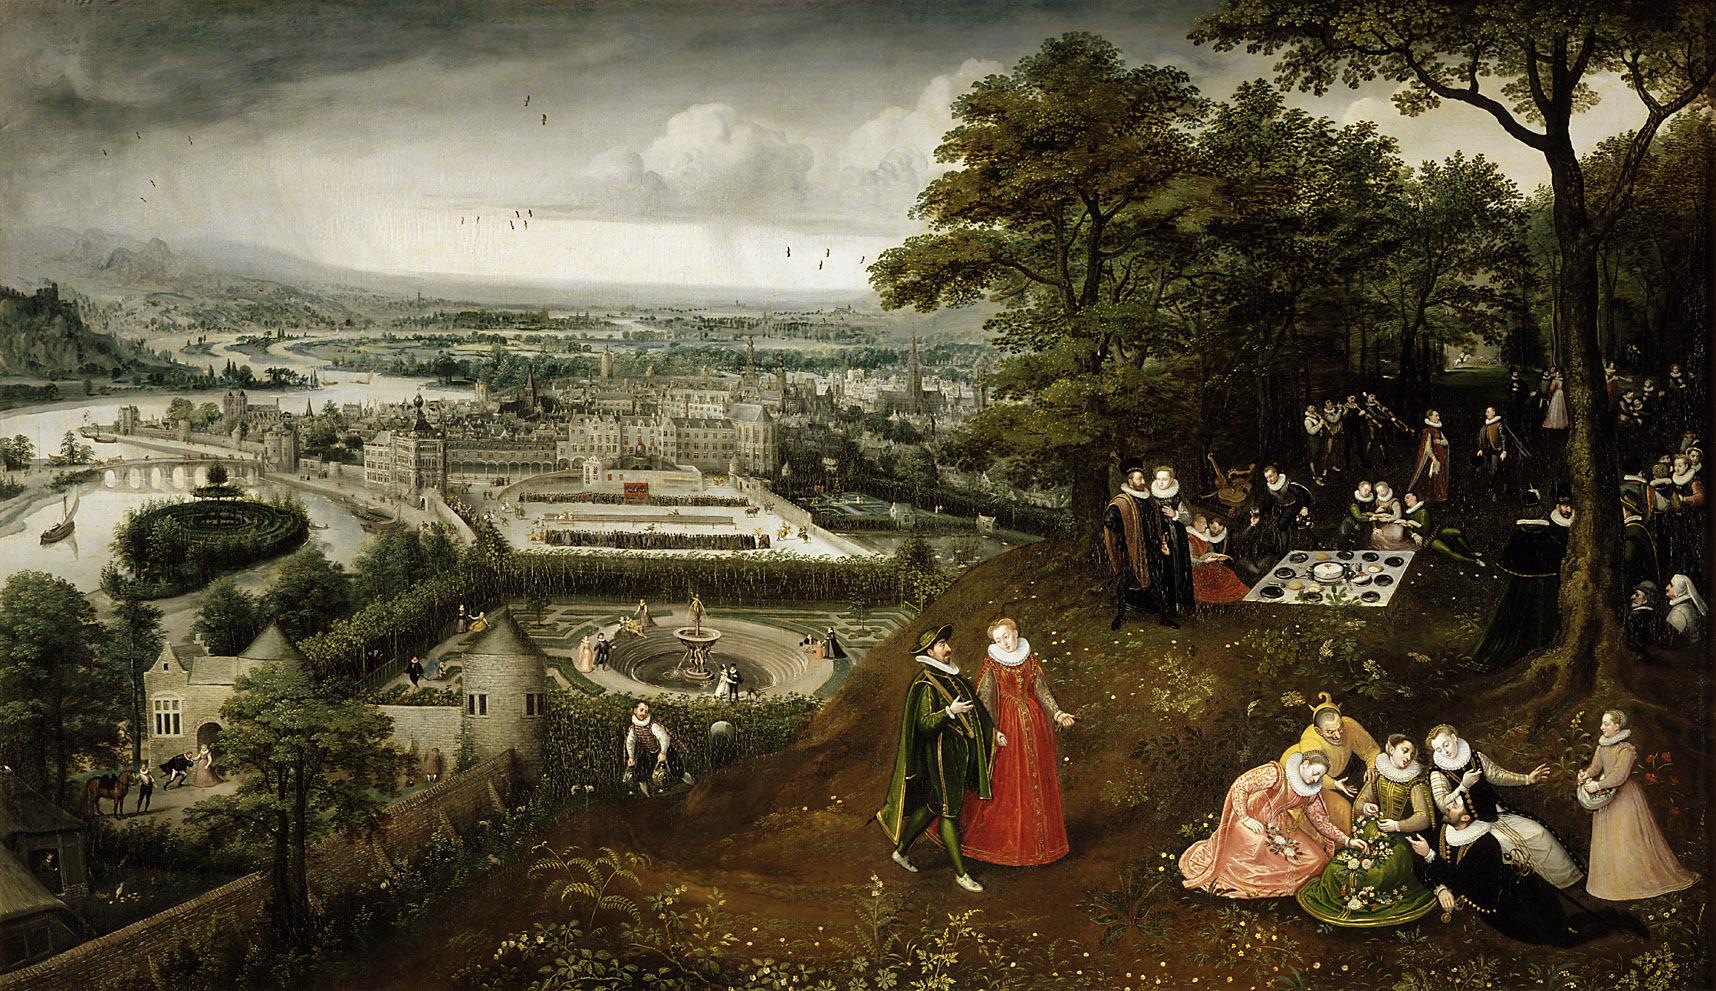 Frühlingslandschaft (Mai) von Lucas I. van Valckenborch